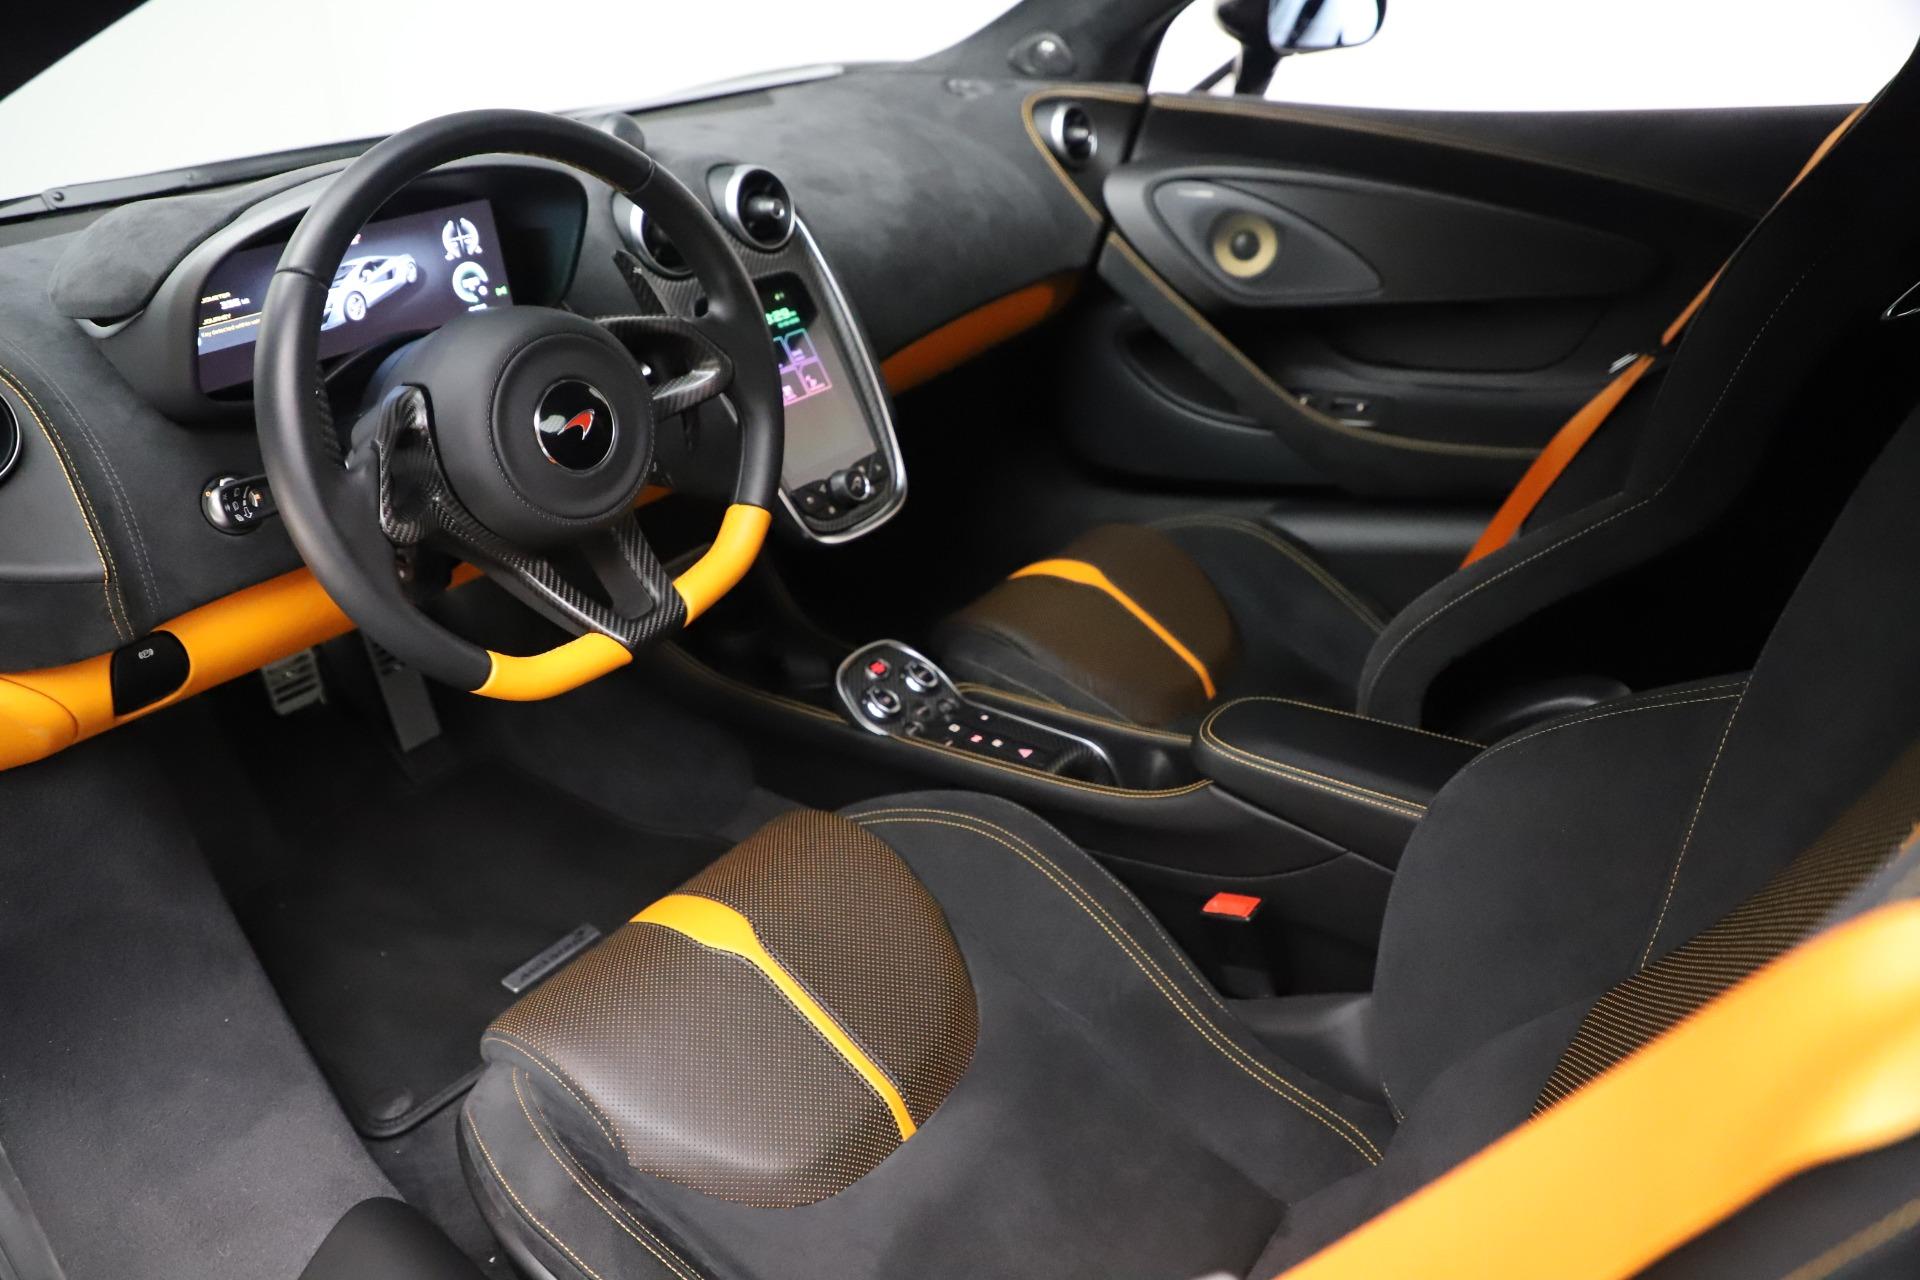 Used 2017 McLaren 570S Coupe For Sale In Westport, CT 3503_p16